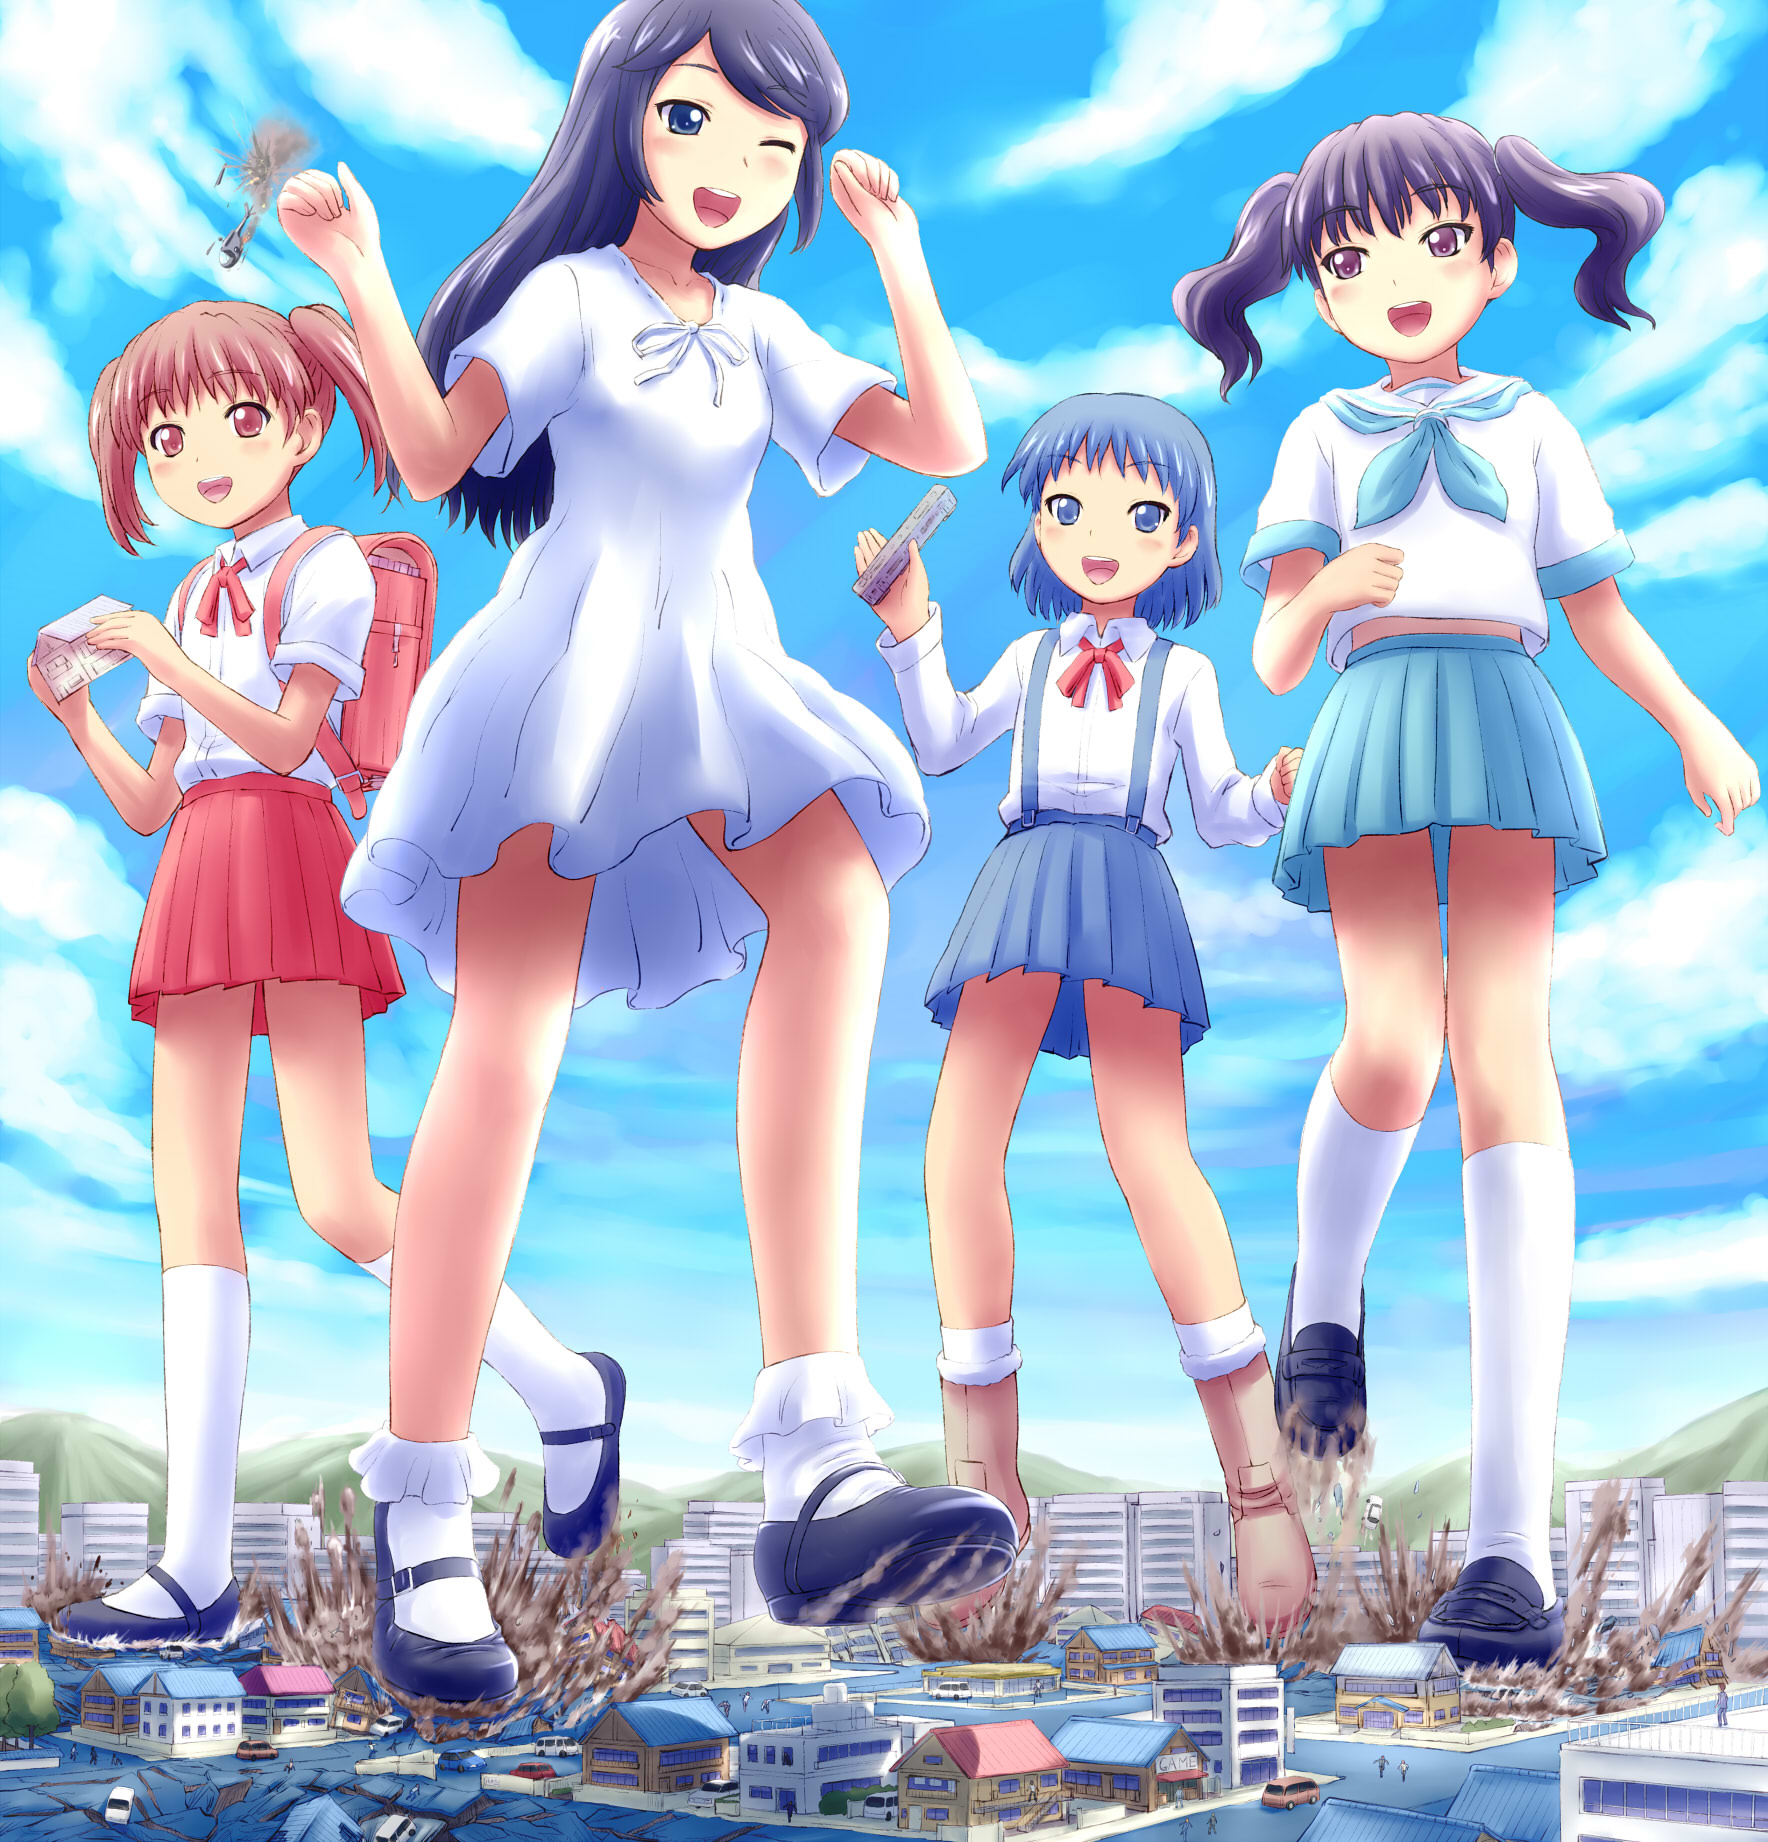 Anime Schoolgirl Upskirt anime giantess schoolgirl upskirt | joss picture cam